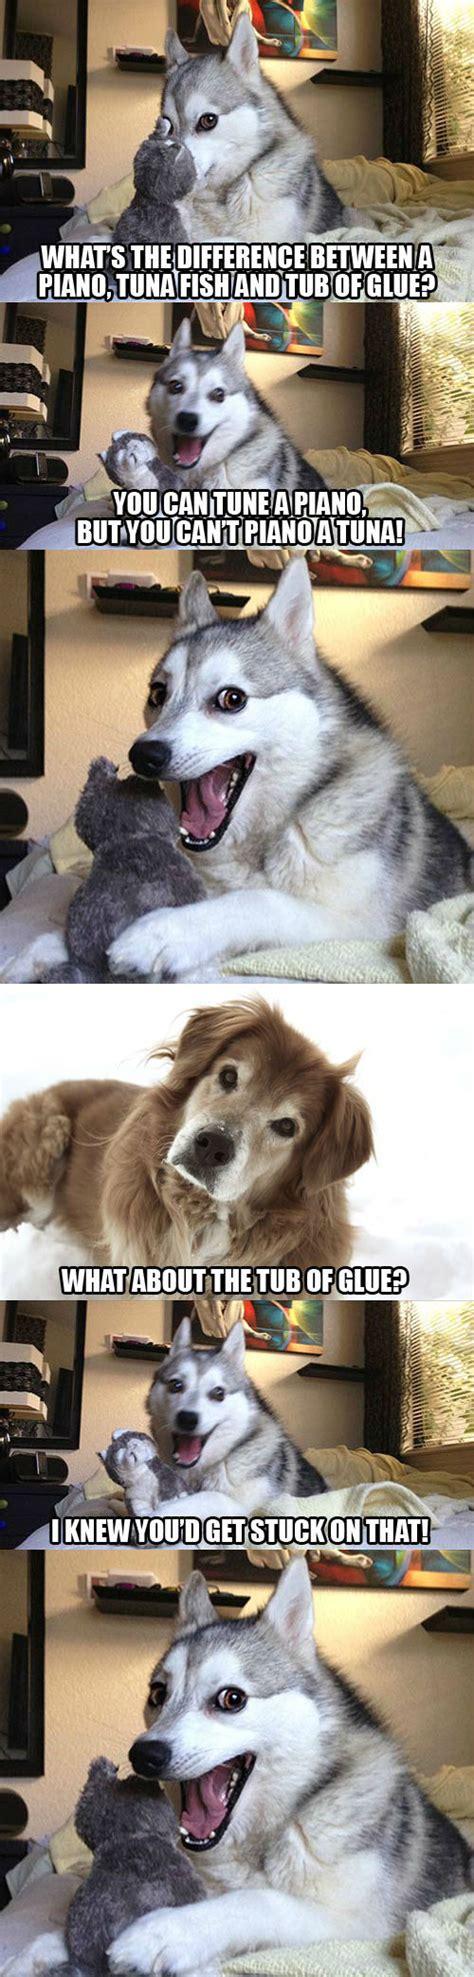 Bad Dog Meme - dog pun memes